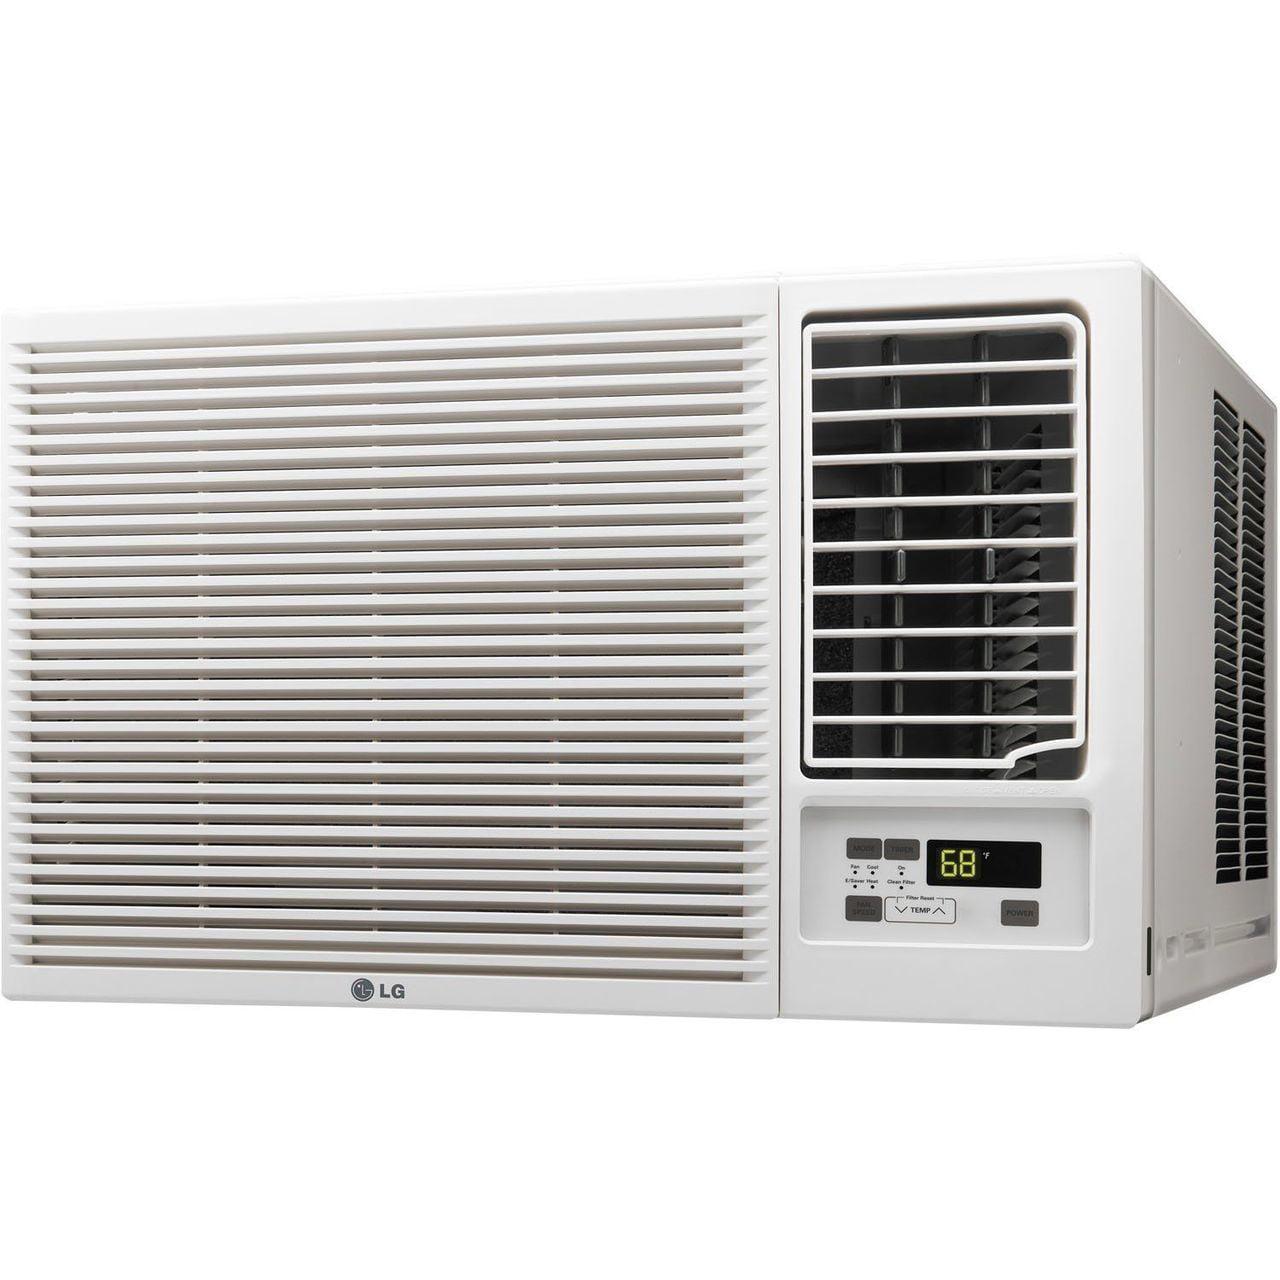 LG 18,000 BTU 230/208-Volt Window Air Conditioner with Co...